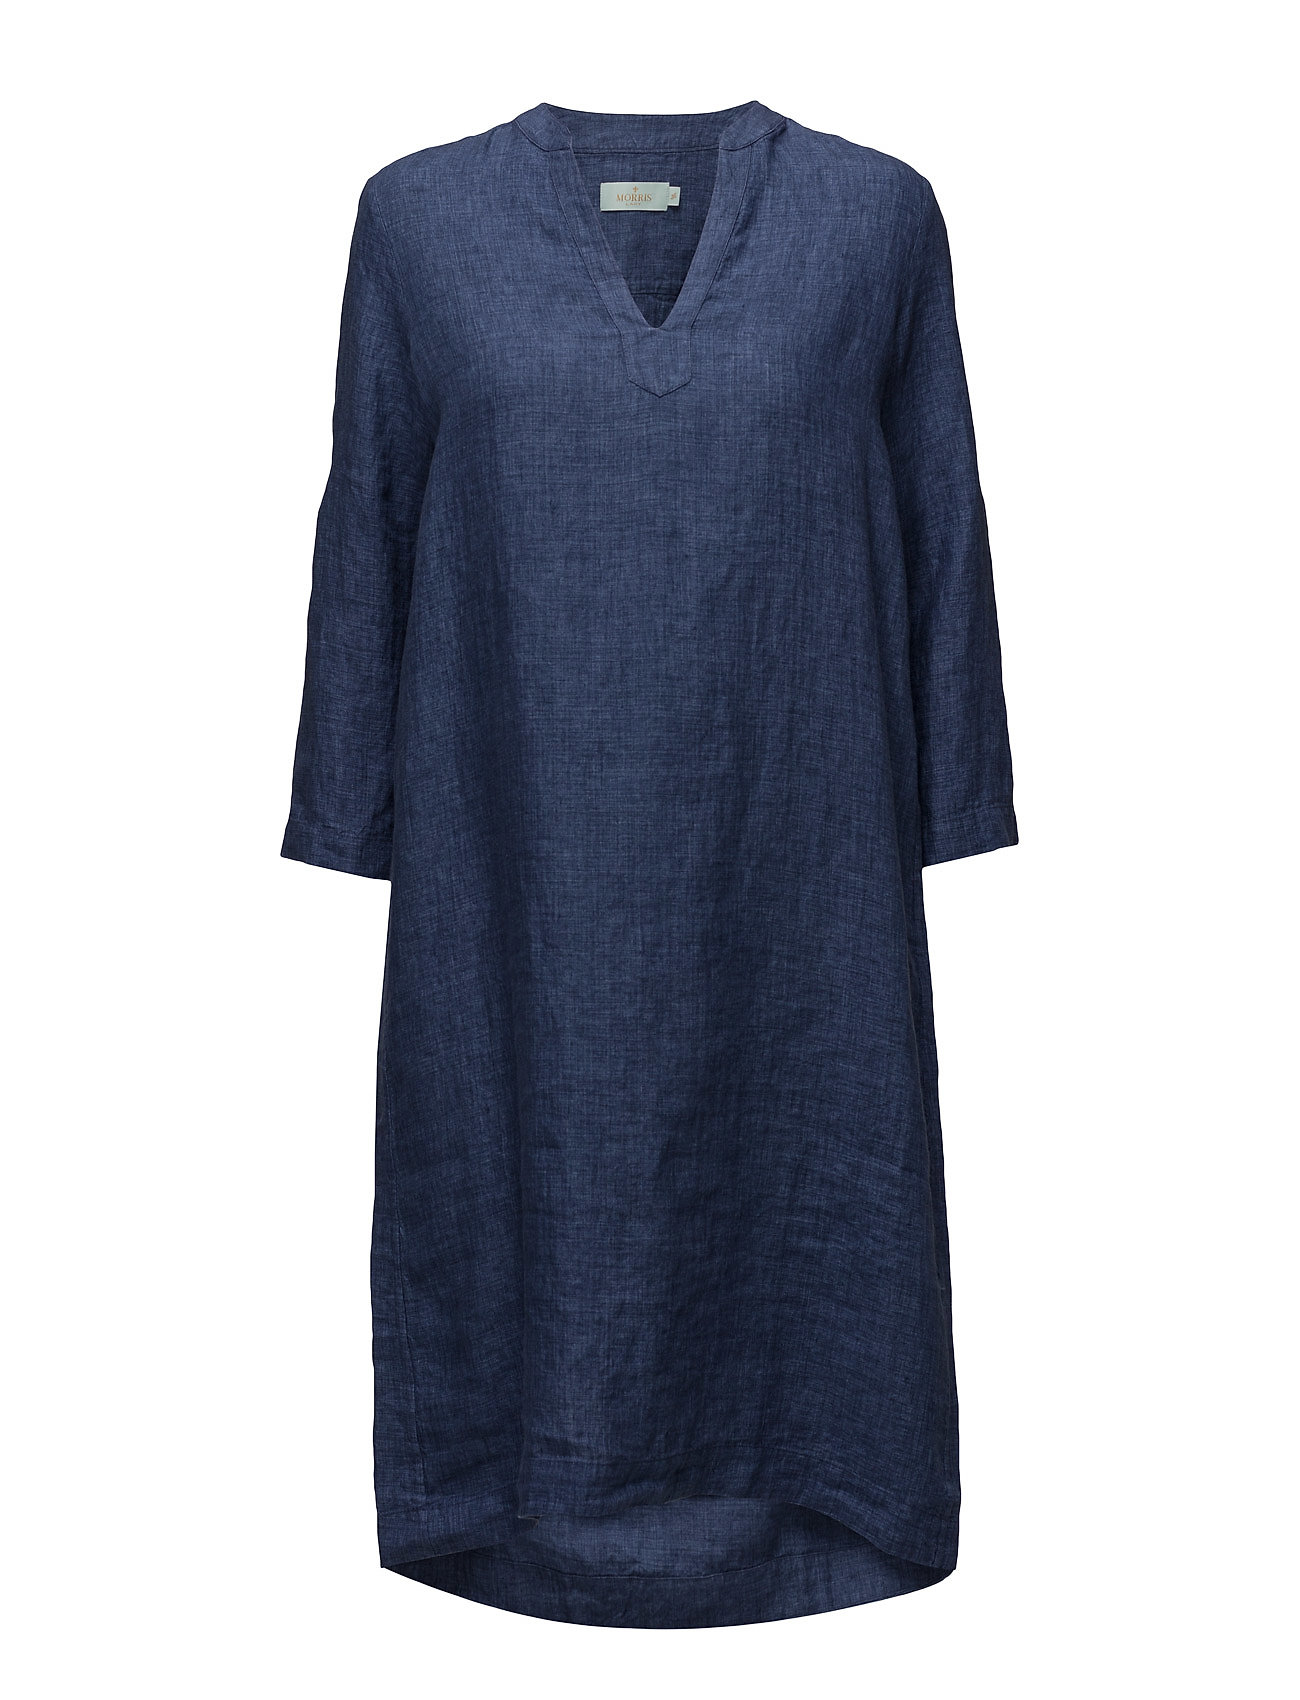 Sandrine Dress Morris Lady Tunikaer til Kvinder i Blå